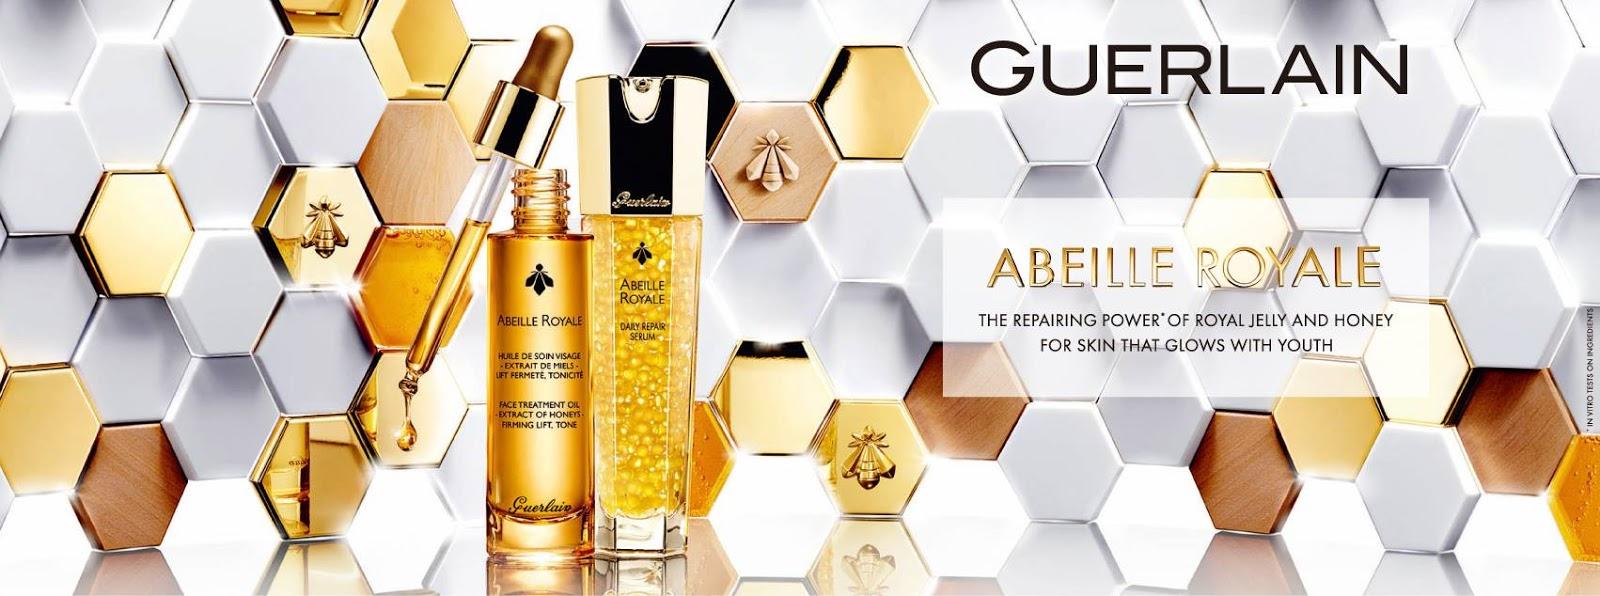 Guerlain 嬌蘭 Abeille Royale 蜂蜜活肌精華爽膚水的圖片搜尋結果